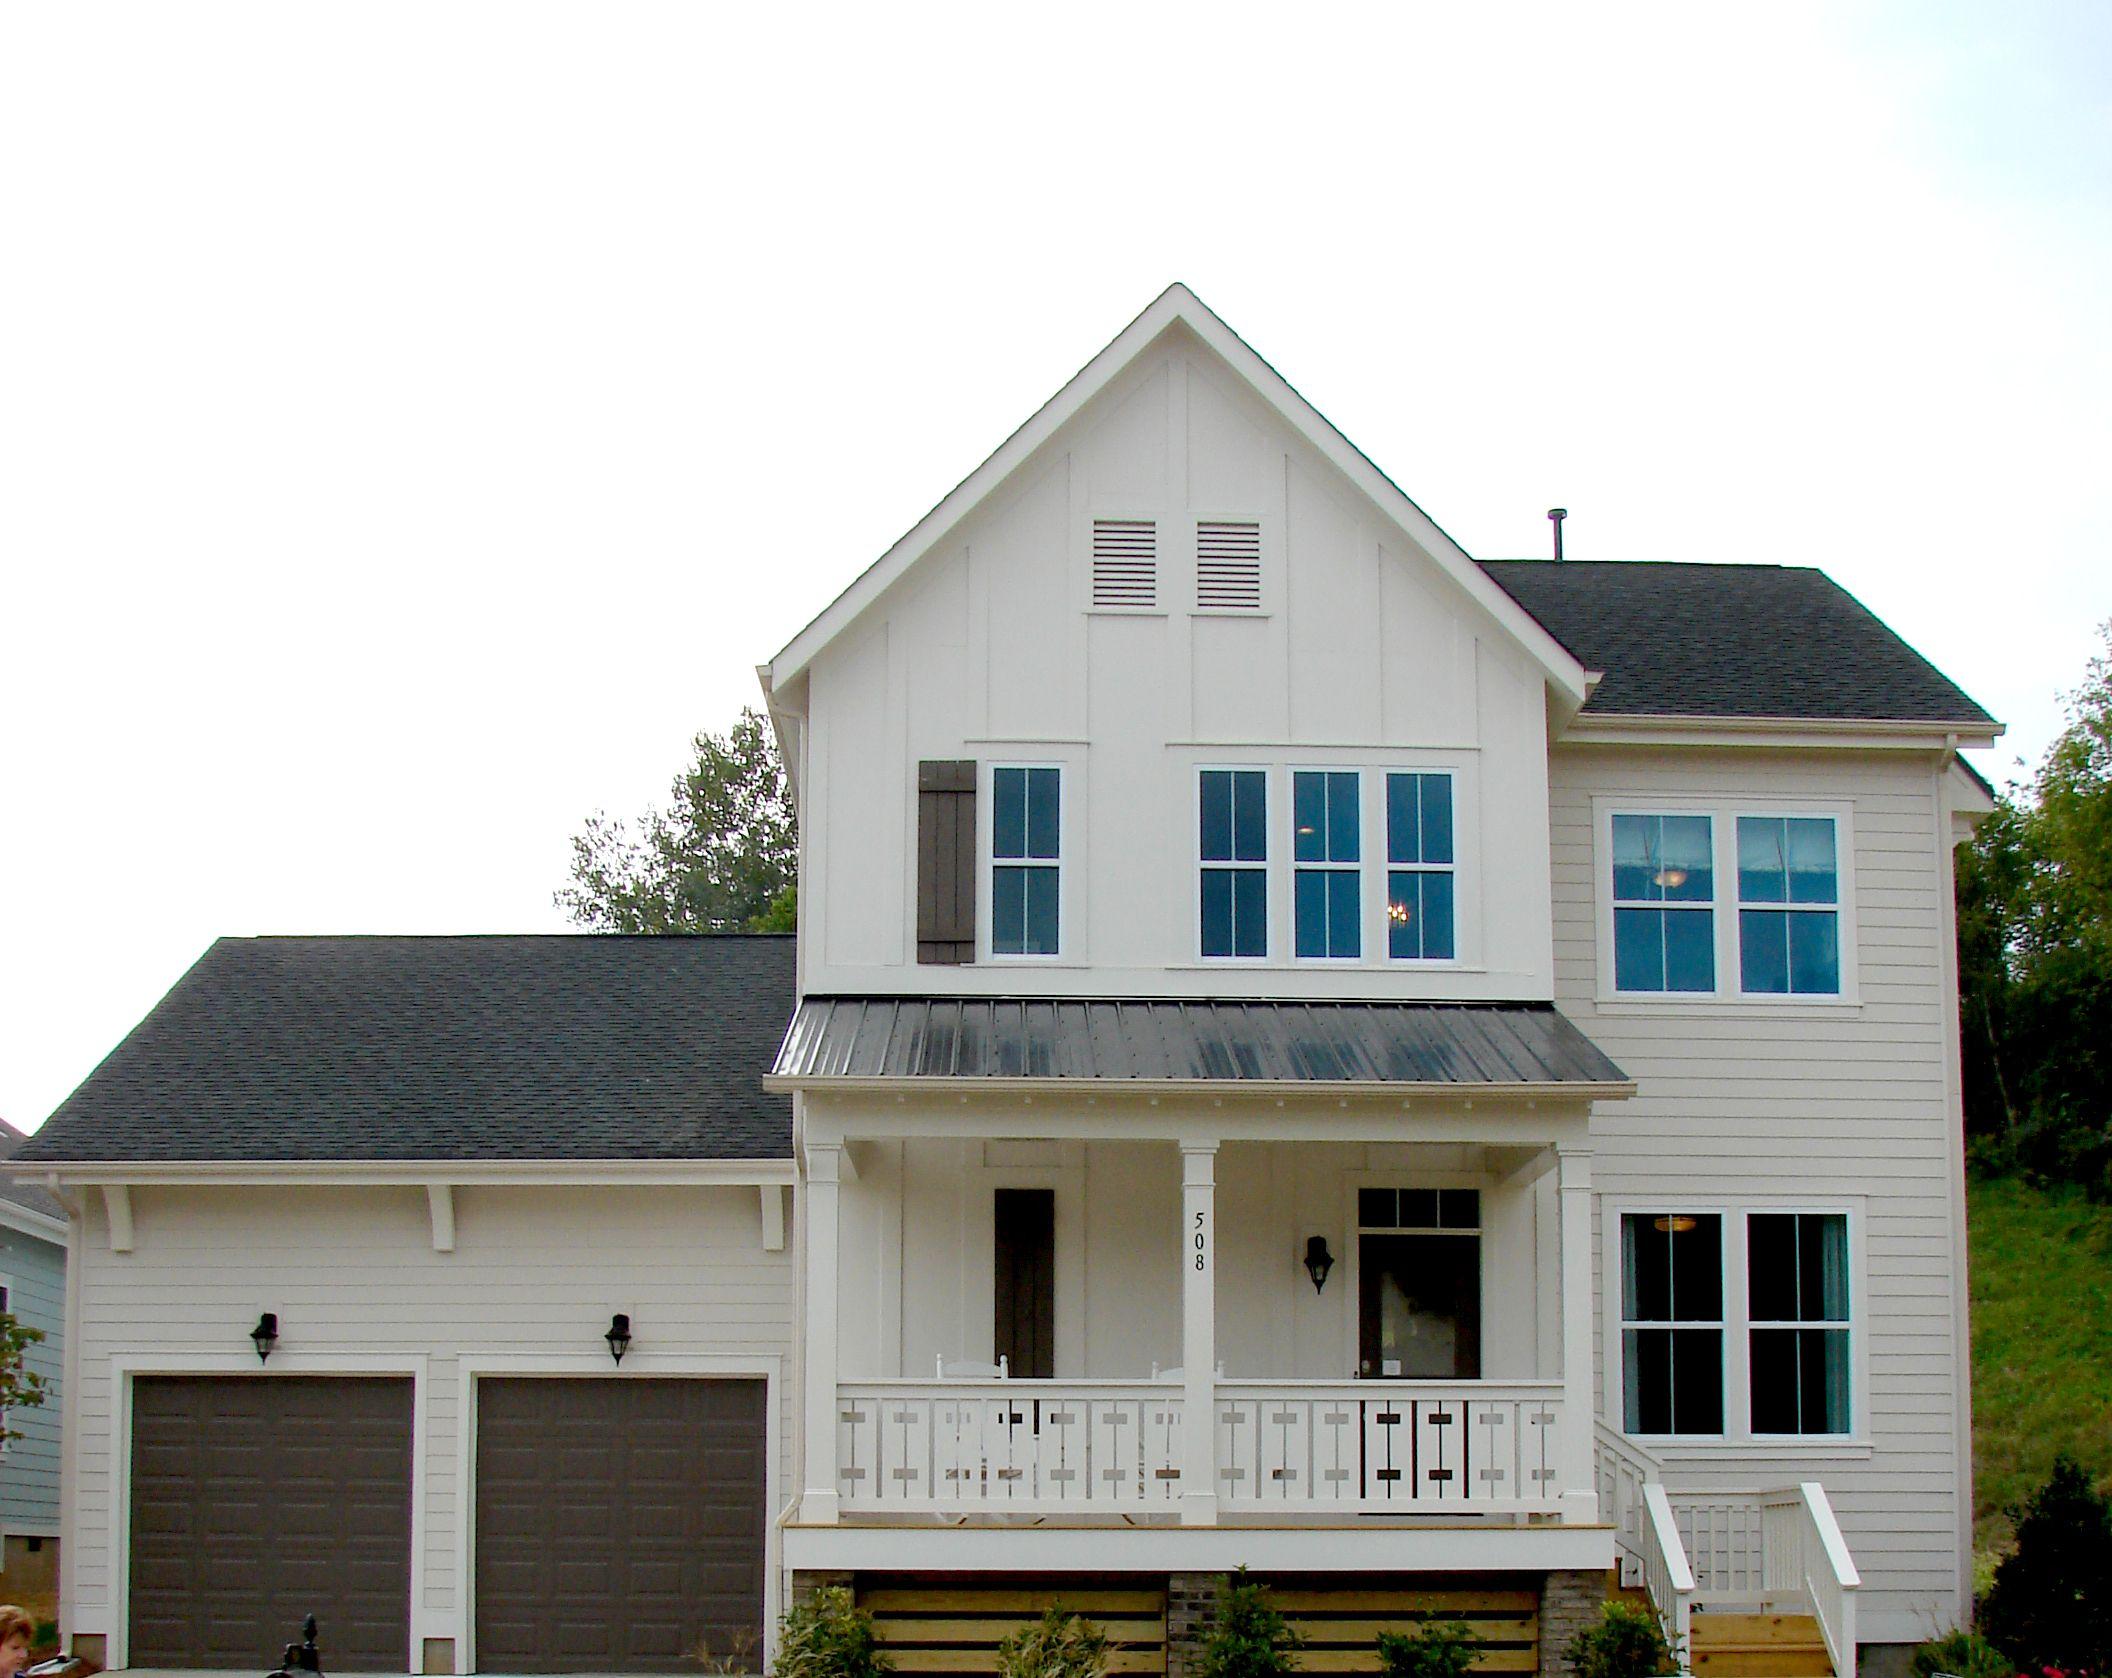 Evans Coghill Brings The Farmhouse To Riverwalk In Rock Hill South Carolina Farmhouse Architecture Modern Farmhouse Plans Modern Farmhouse Design